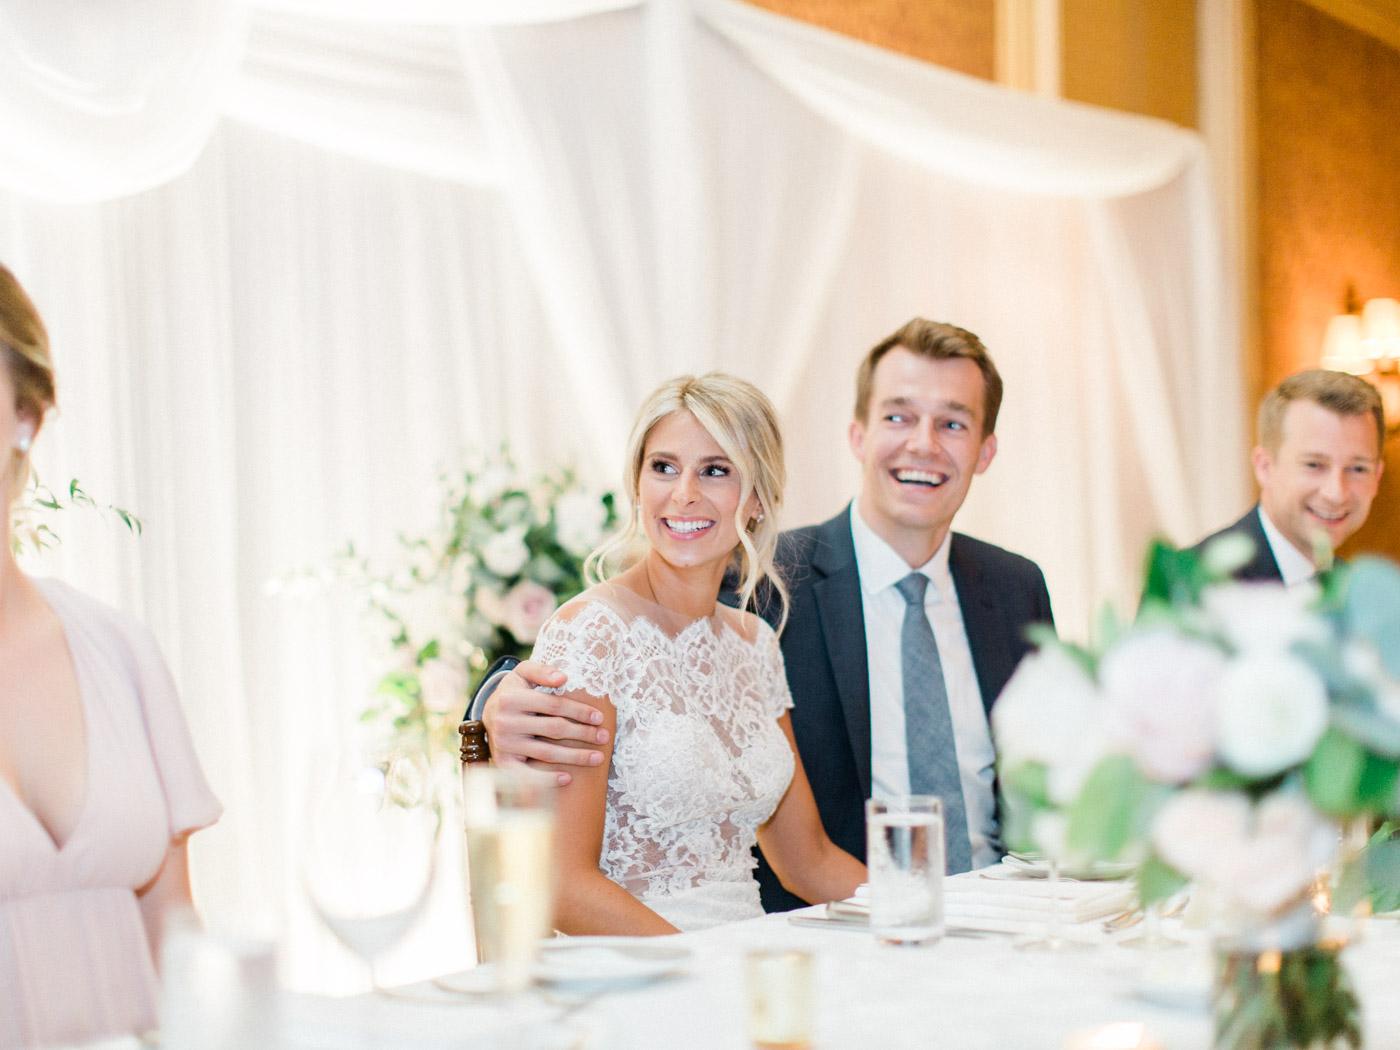 Toronto-Muskoka-wedding-photographer-summery-fun-documentary-the-marriott-rosseau118.jpg